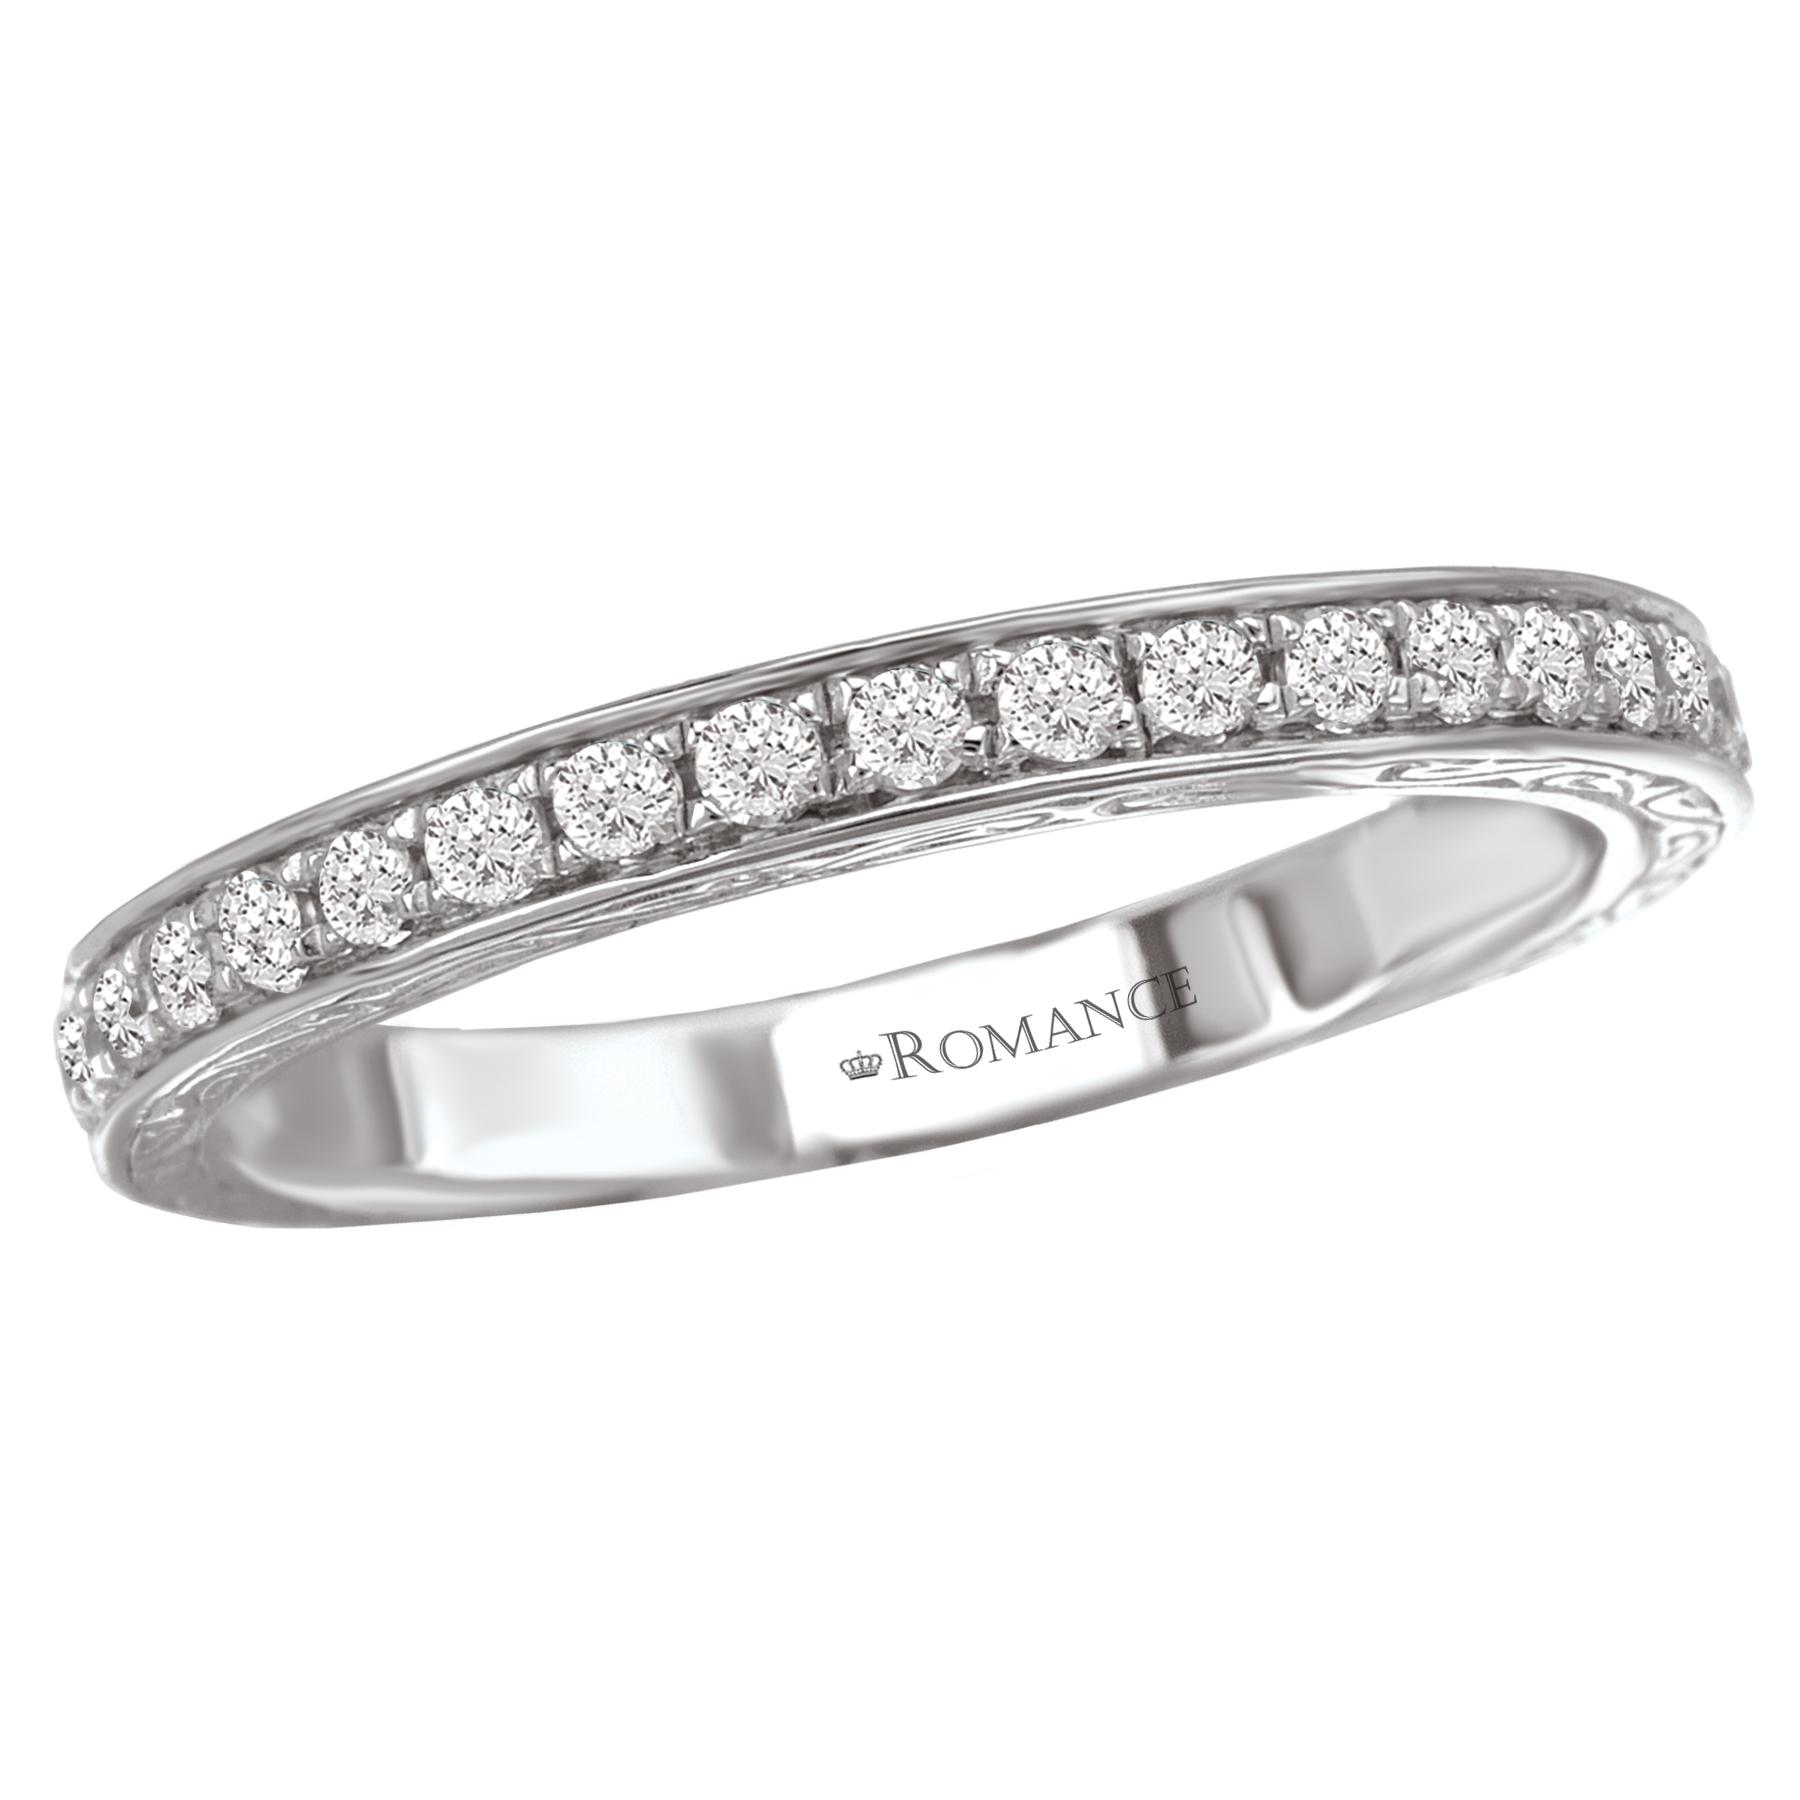 Romance Wedding Bands 117532-W product image